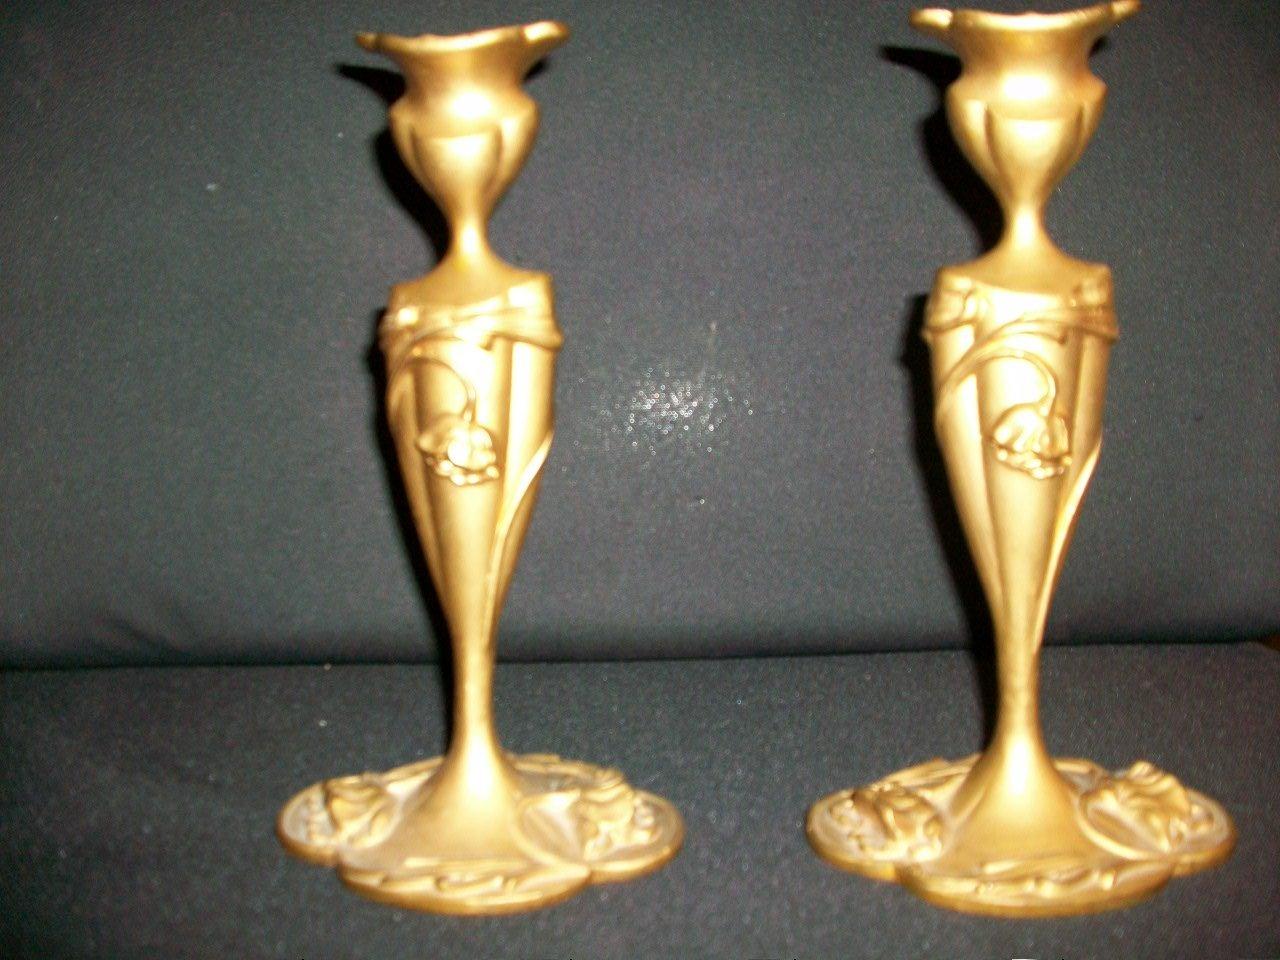 Antique A-M-W Candlesticks